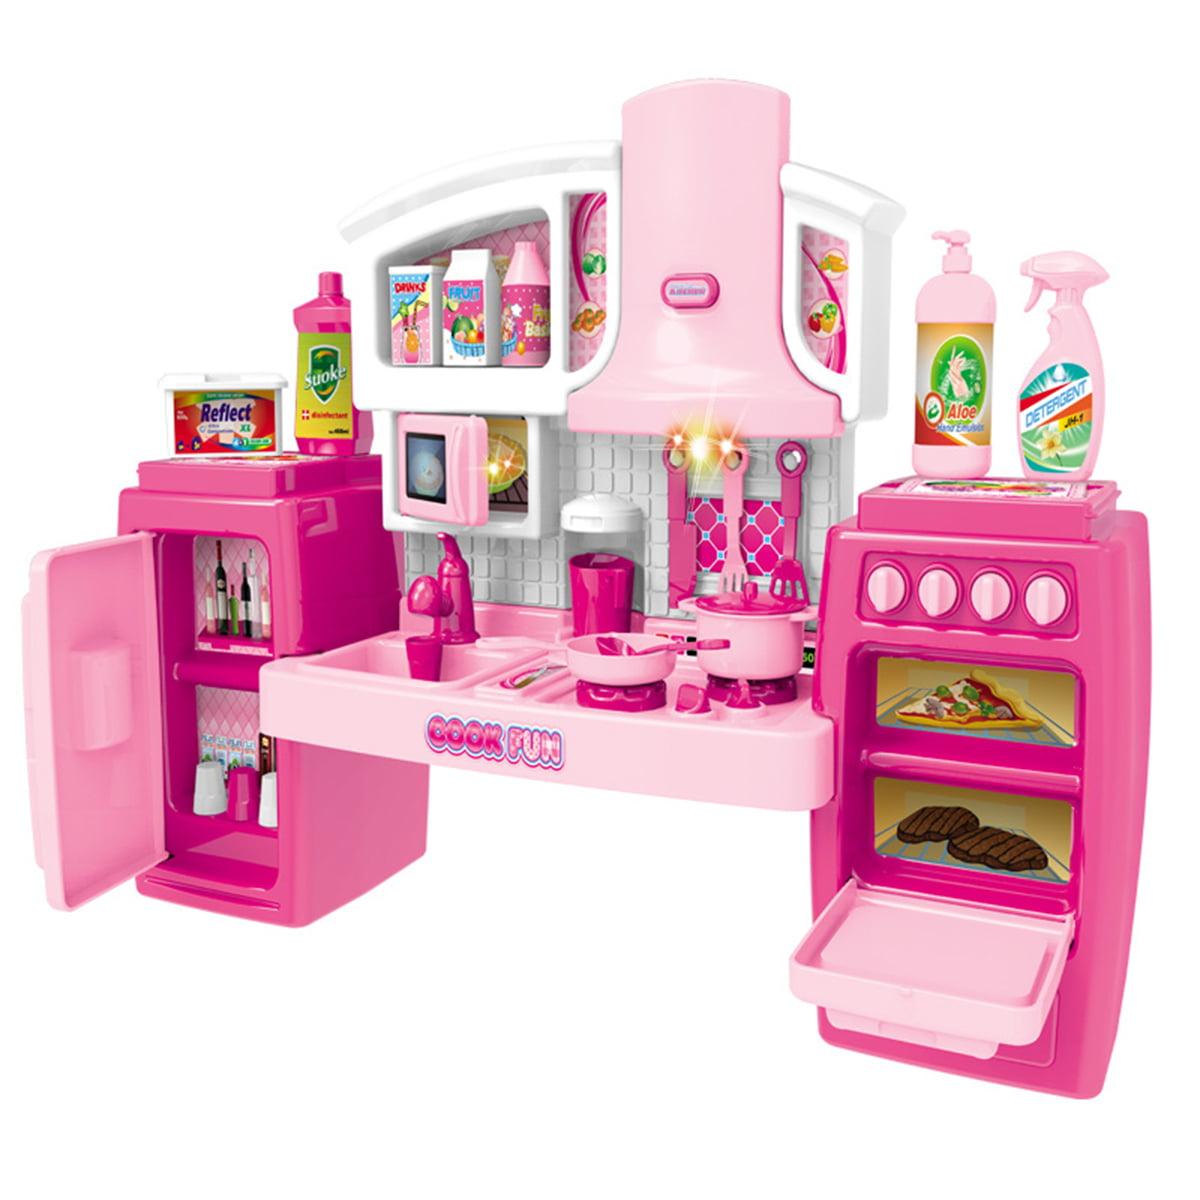 Electronic Kitchen Cooking Children Kids Play Set Toy W Light Sound Walmart Com Walmart Com